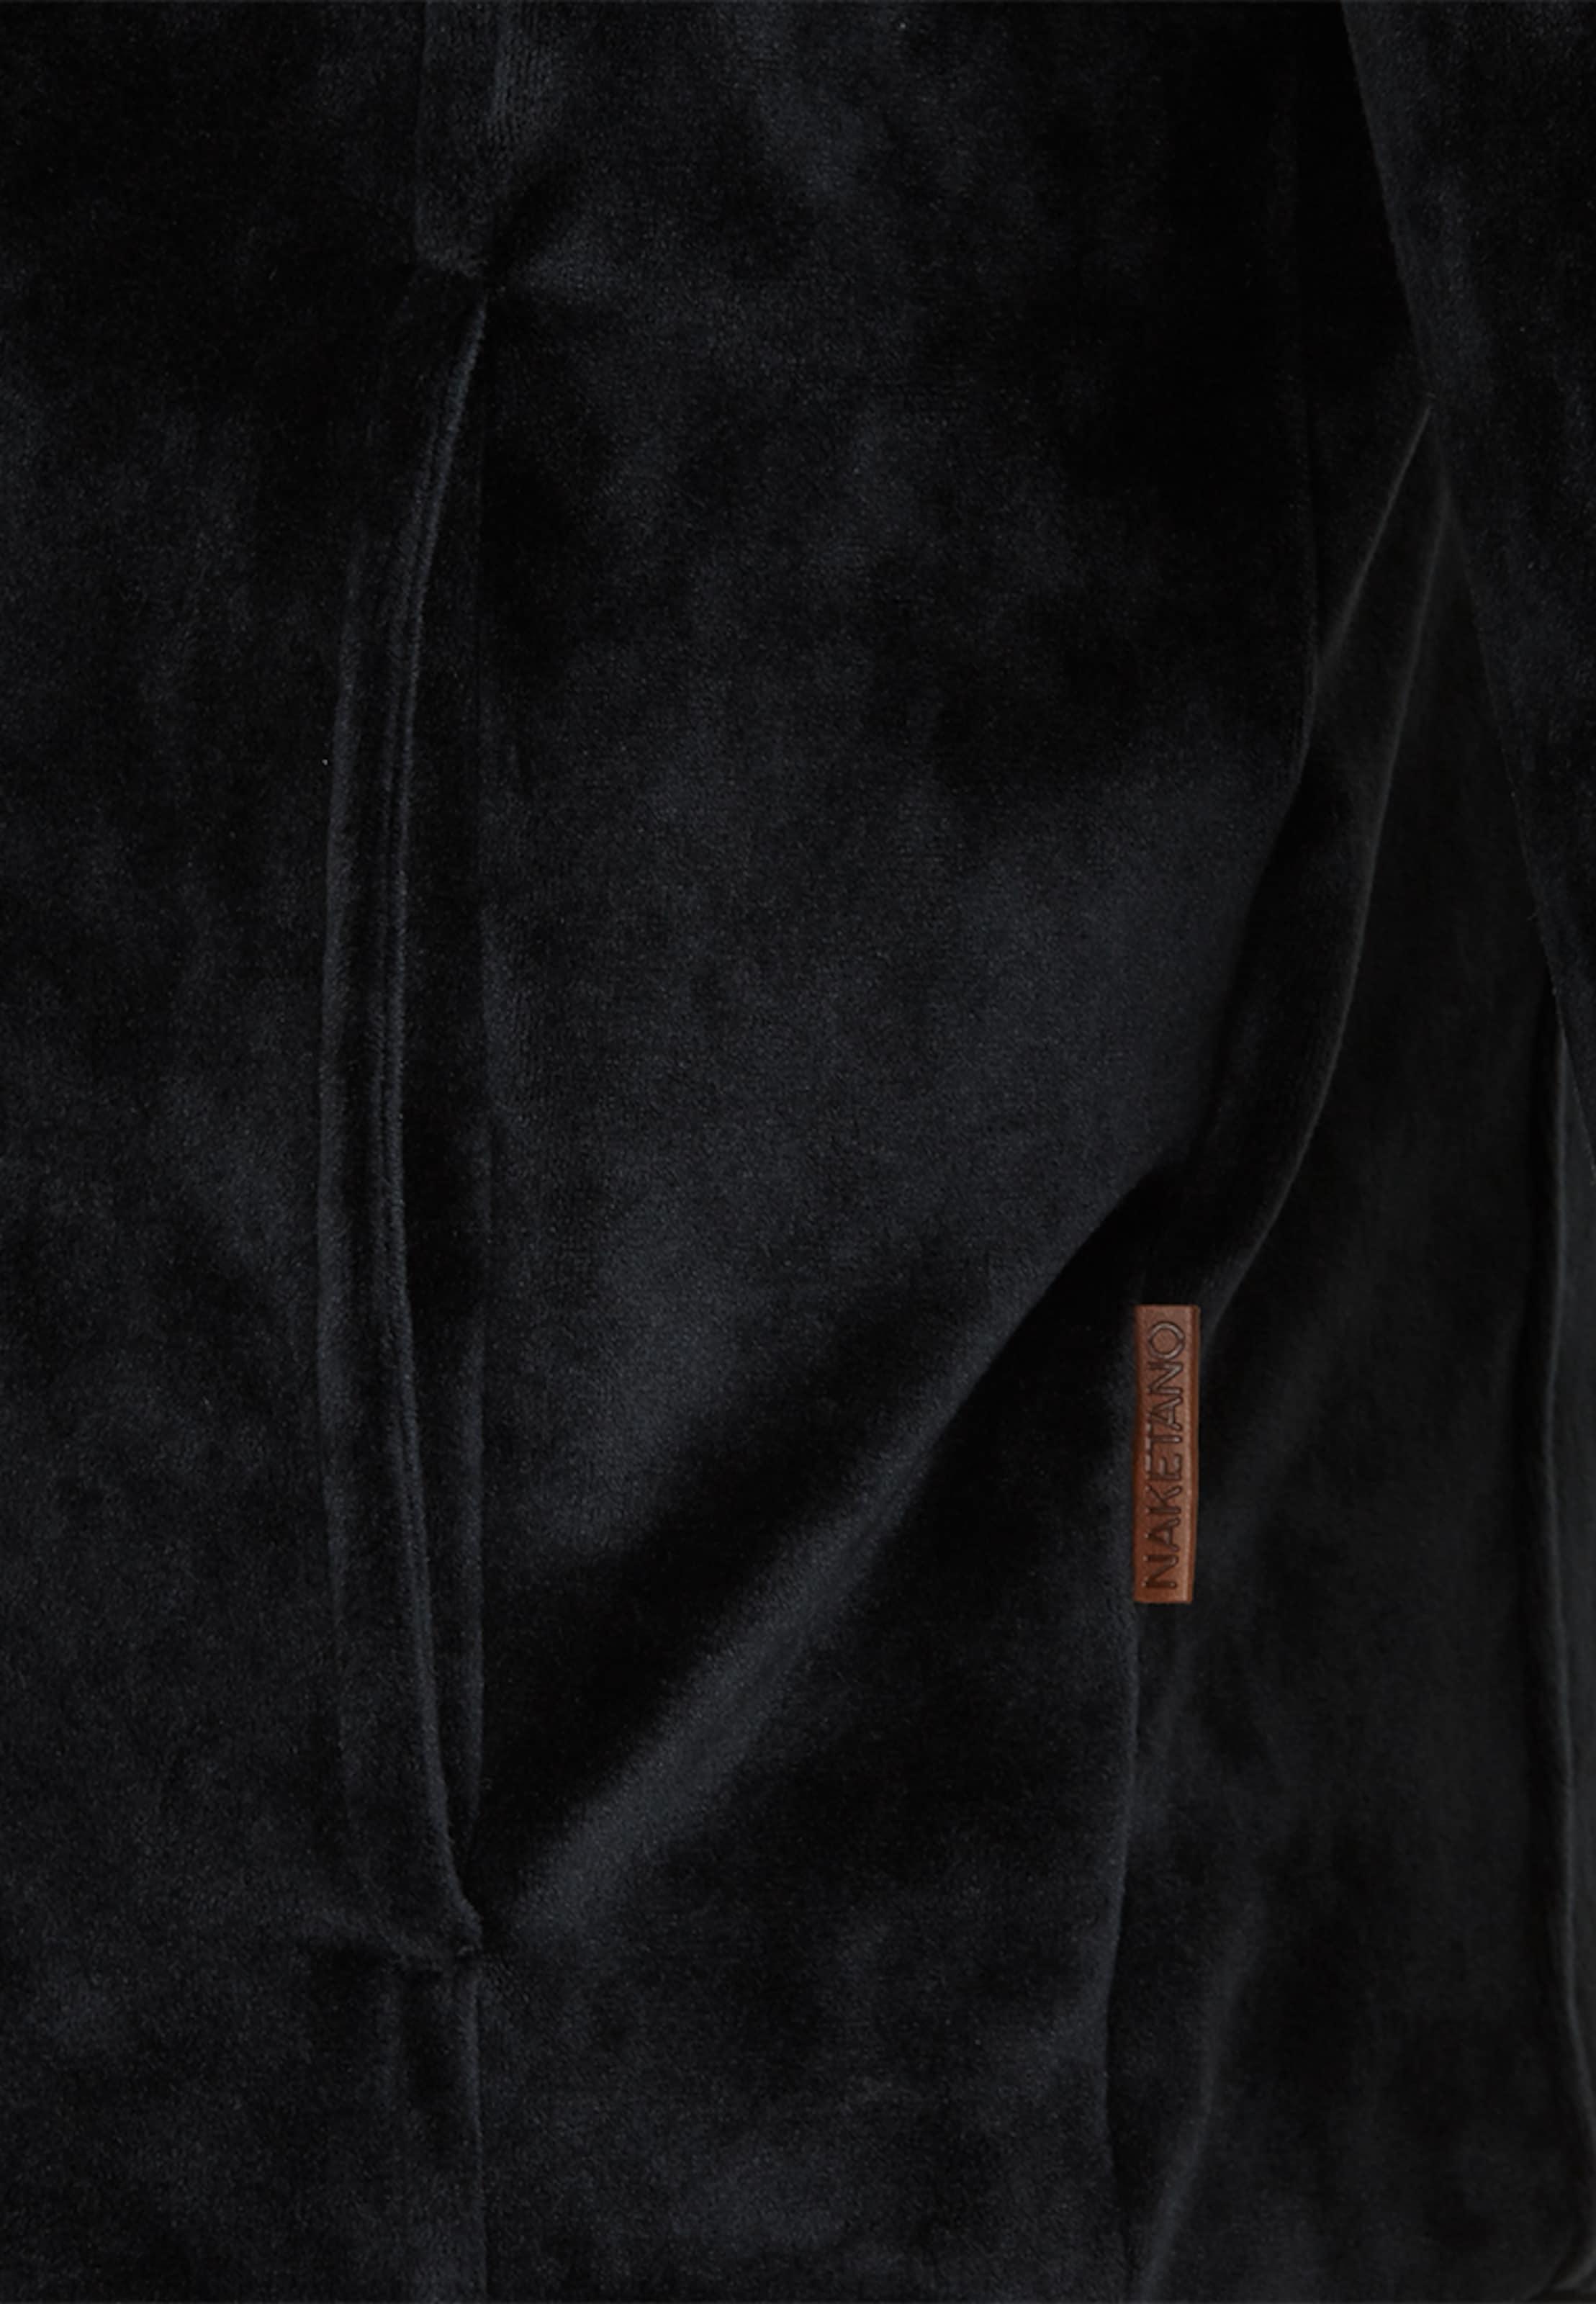 Survêtement Noir Veste En Mack' 'birol Naketano De EHYIDW29